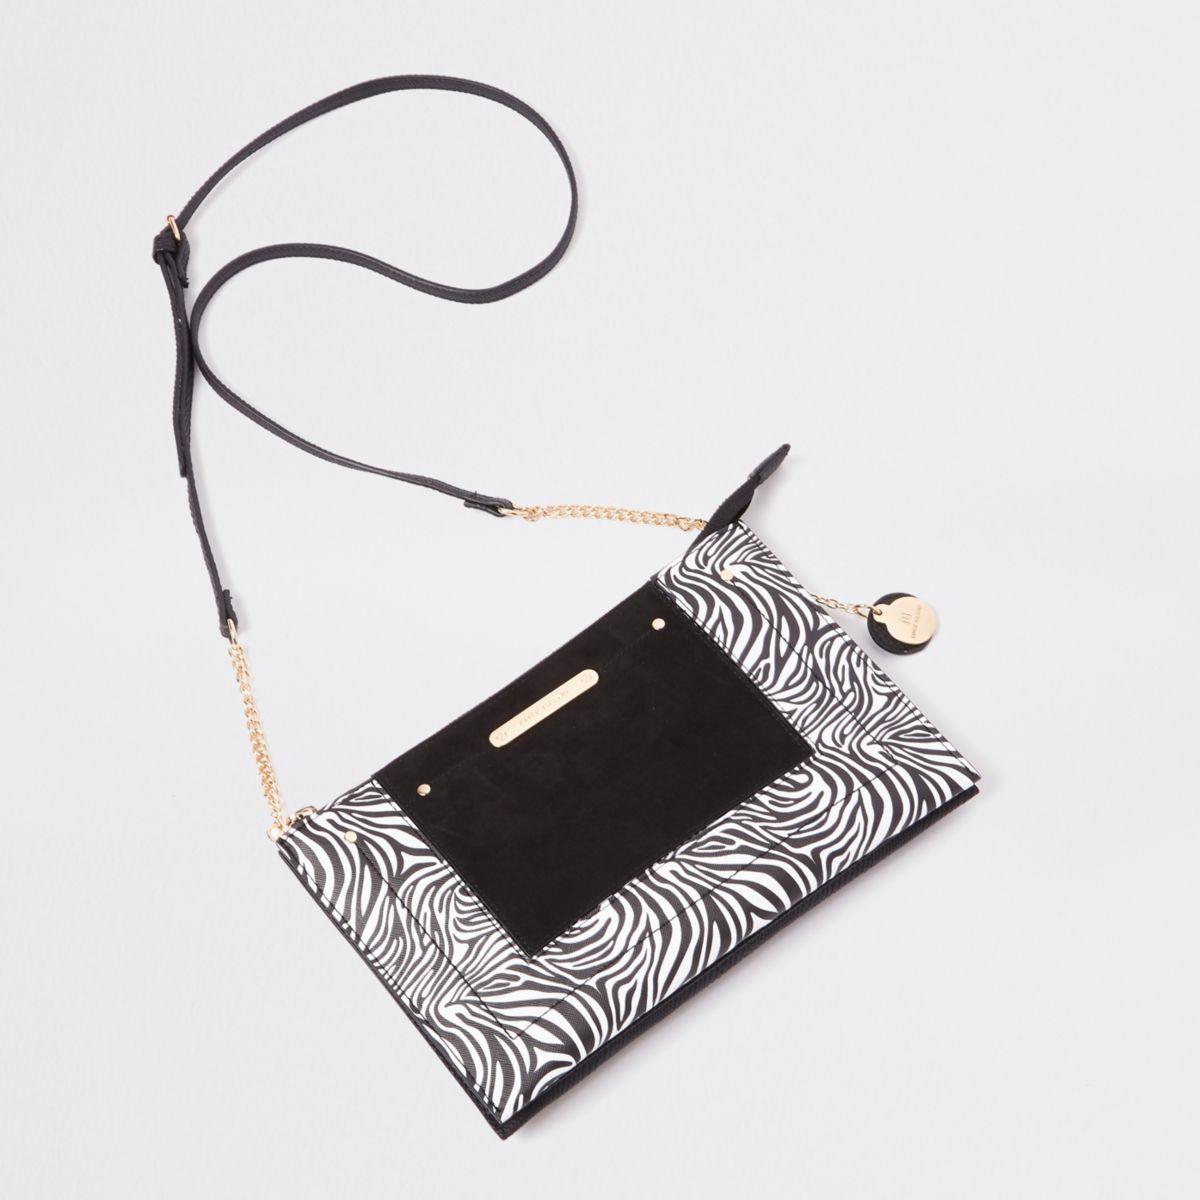 Black zebra print cross body pouch bag